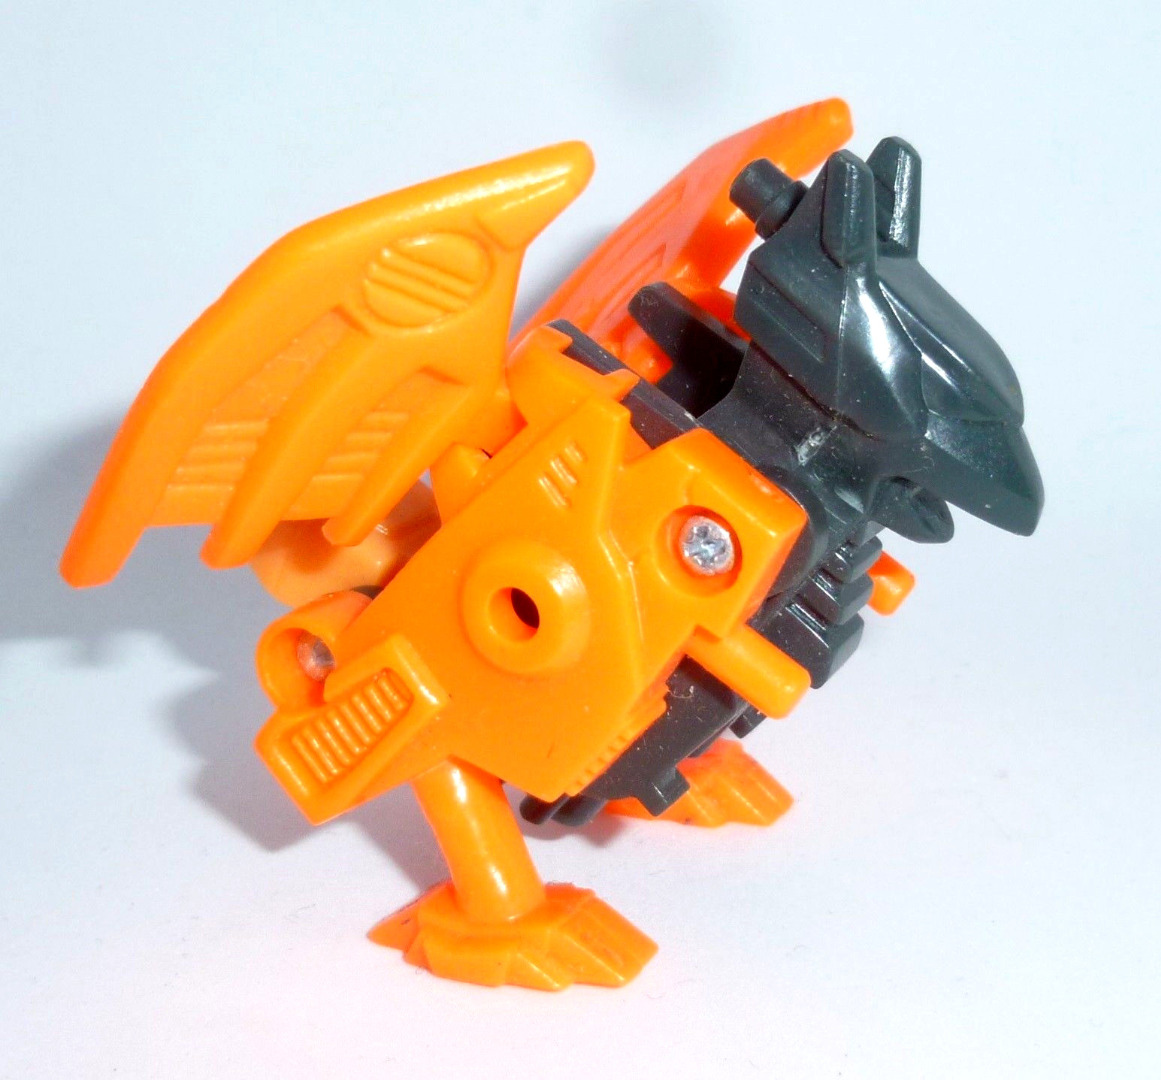 Wingthing - Transformers - G1 Figur Action Masters 1989 Soundwave Actionfigur - Jetzt online Kaufen - 2